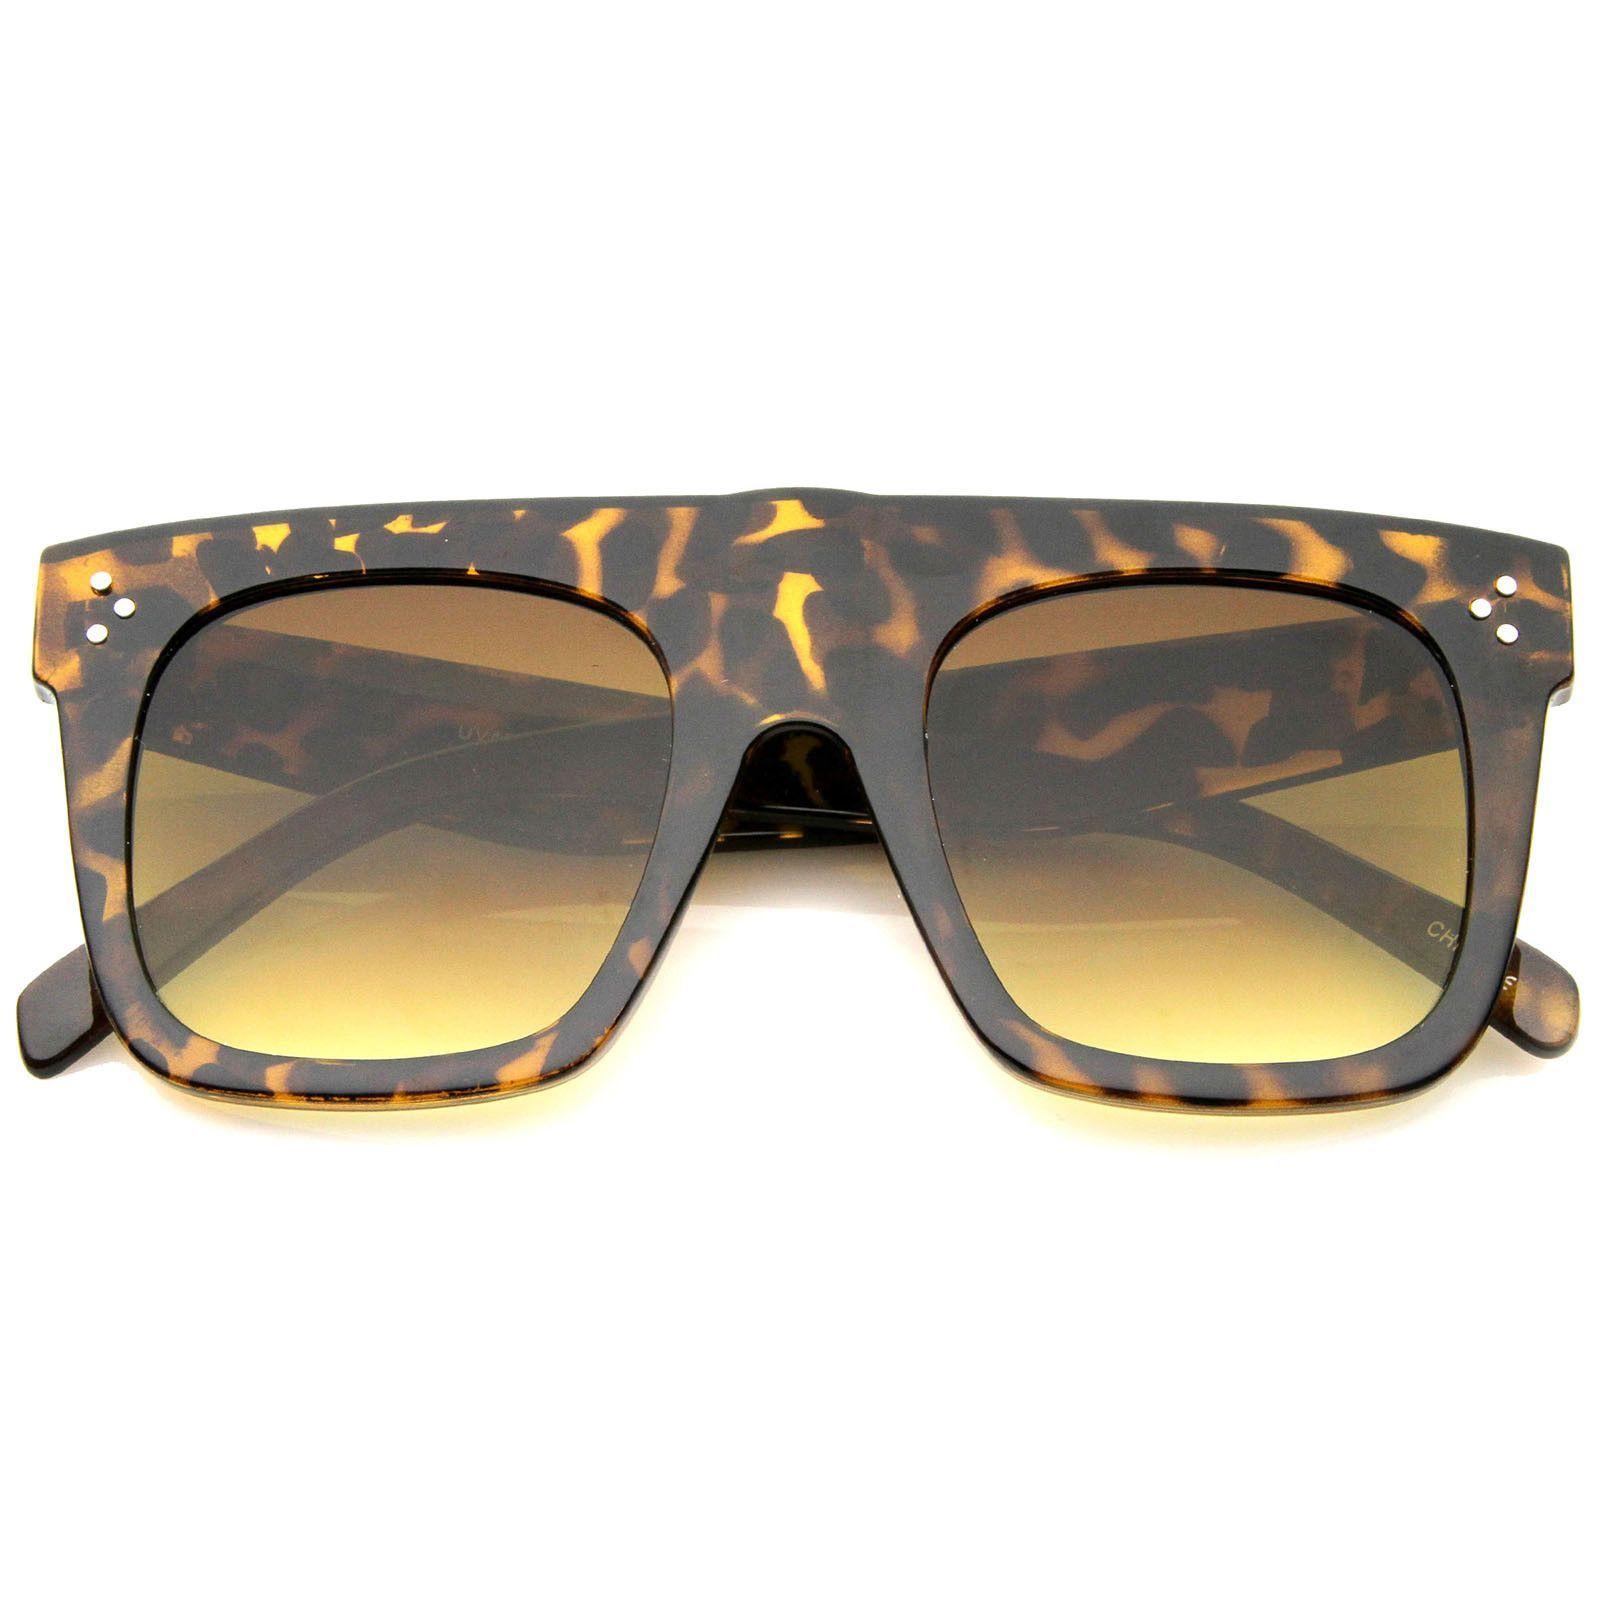 b9a7e74d4d20 Modern Fashion Bold Flat Top Square Horn Rimmed Sunglasses 50mm Cool  Sunglasses